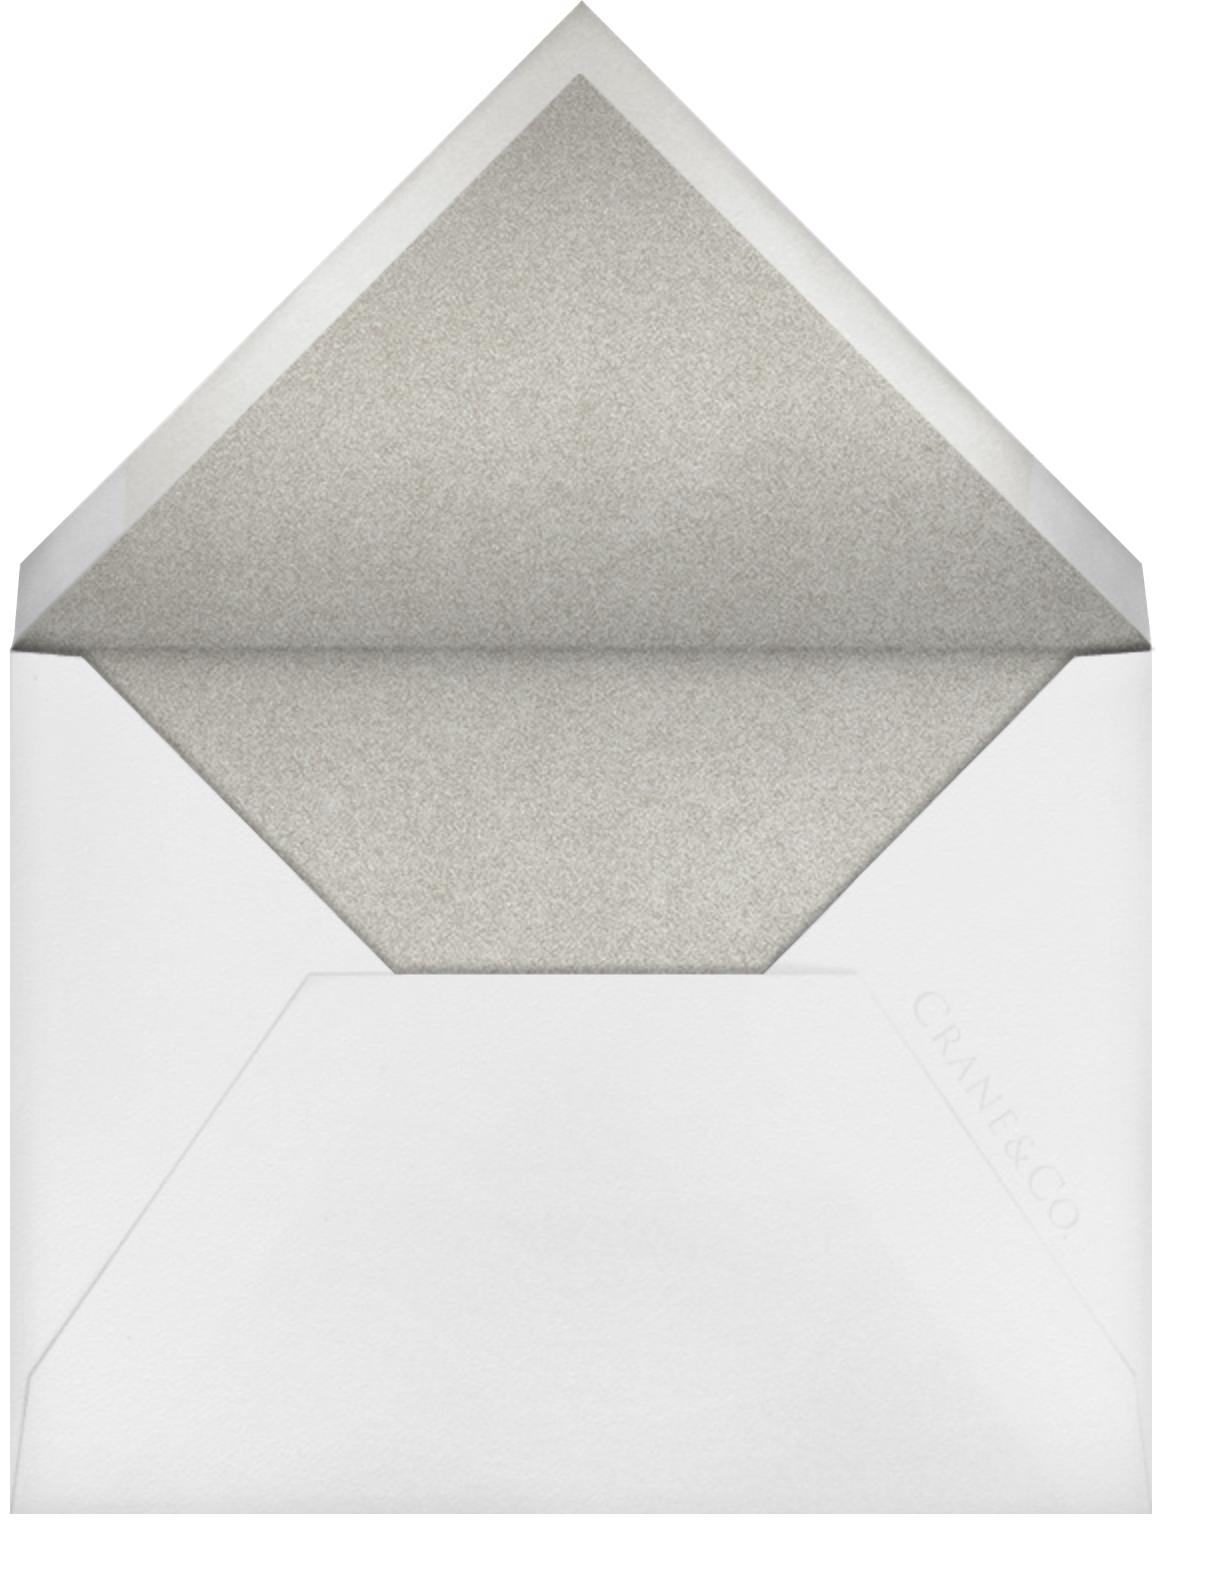 Silk Brocade I - Platinum - Oscar de la Renta - All - envelope back